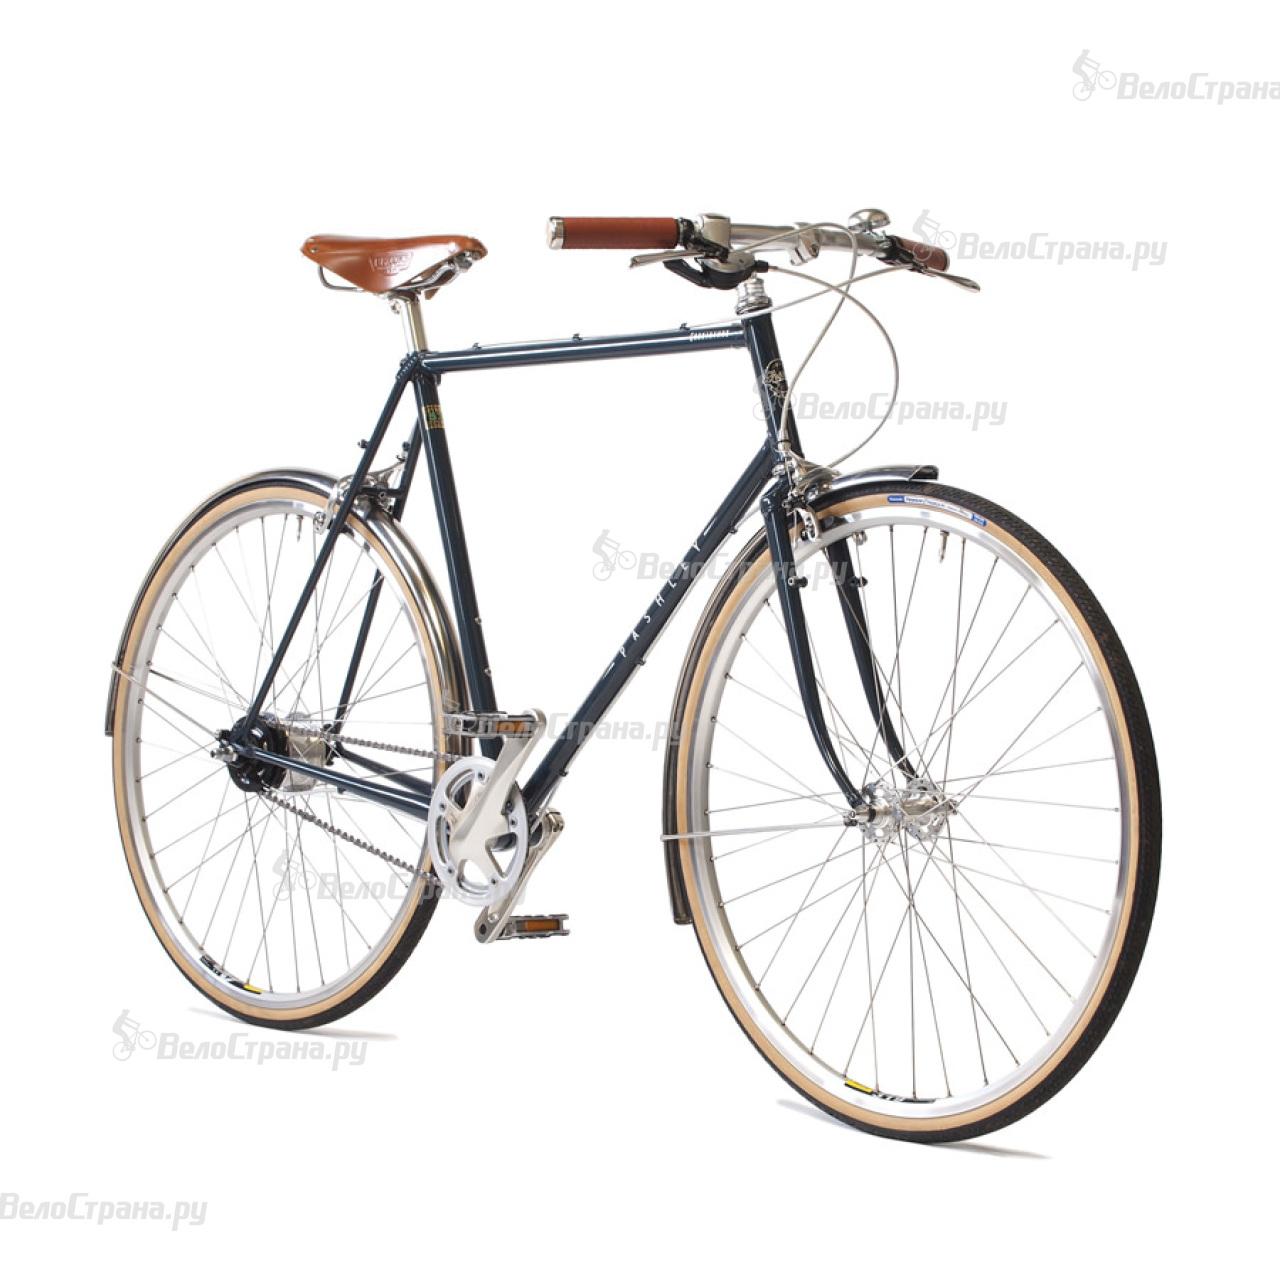 Велосипед Electra Countryman (2017) countryman guiding land use decisions